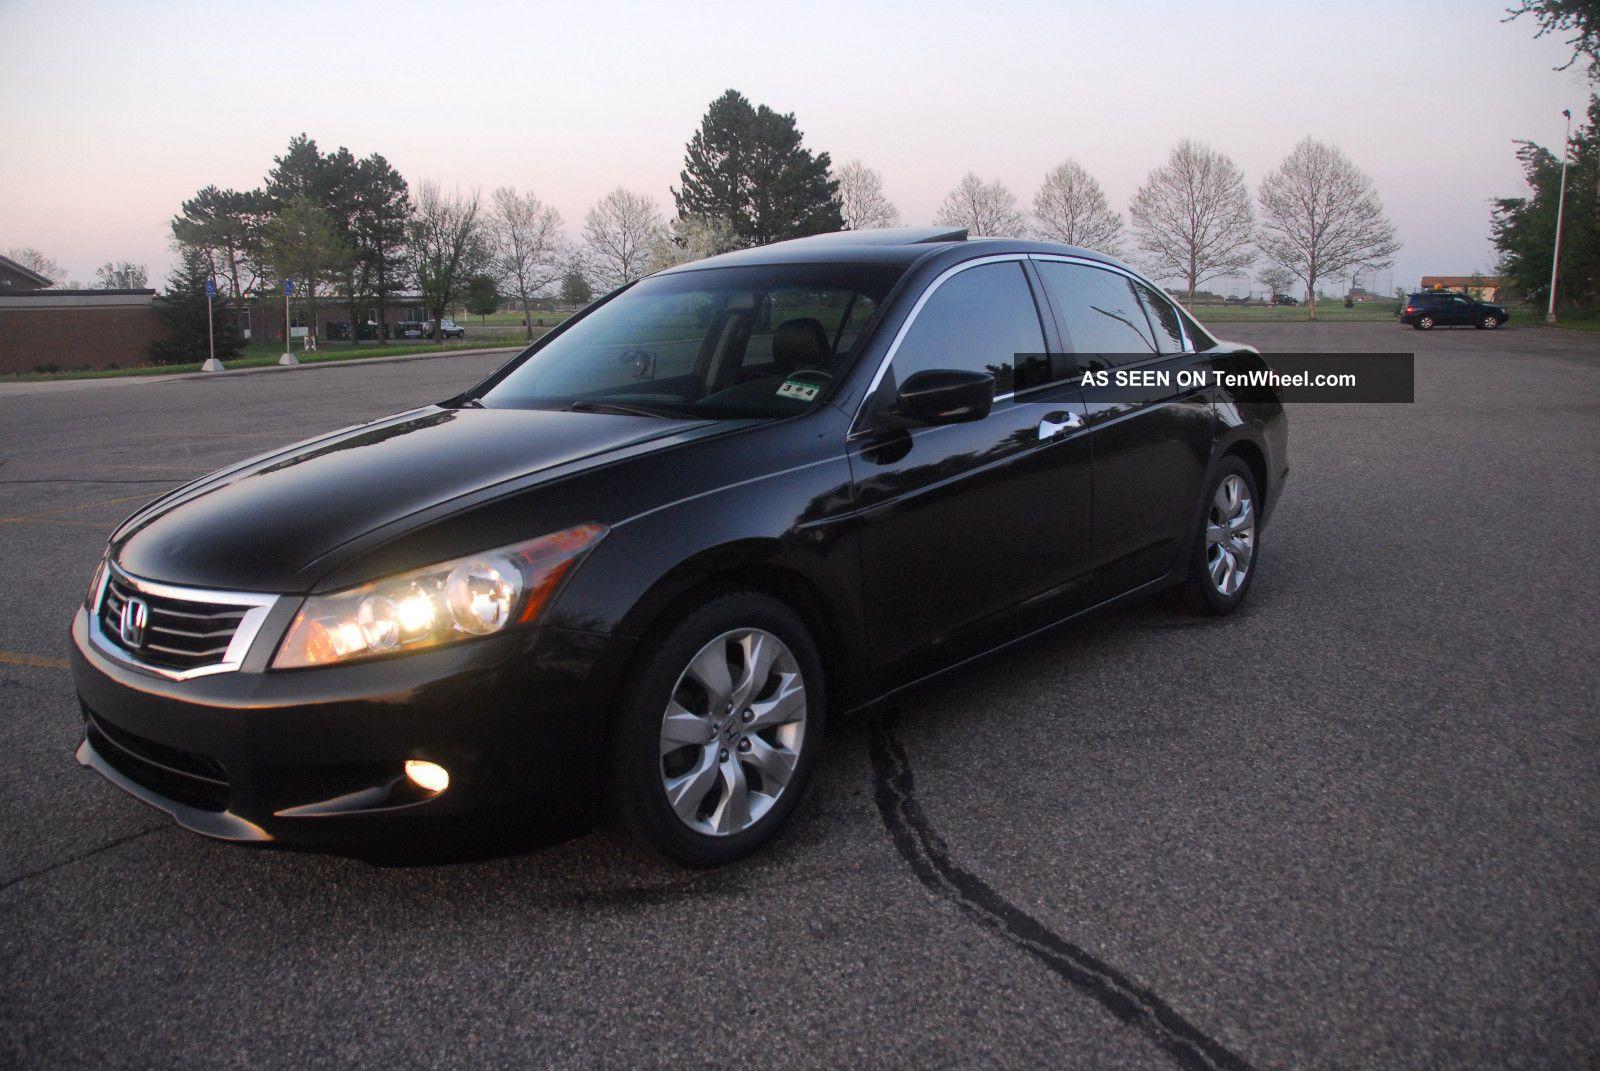 2009 honda accord ex l v6 sedan black on black for Honda accord v6 sedan